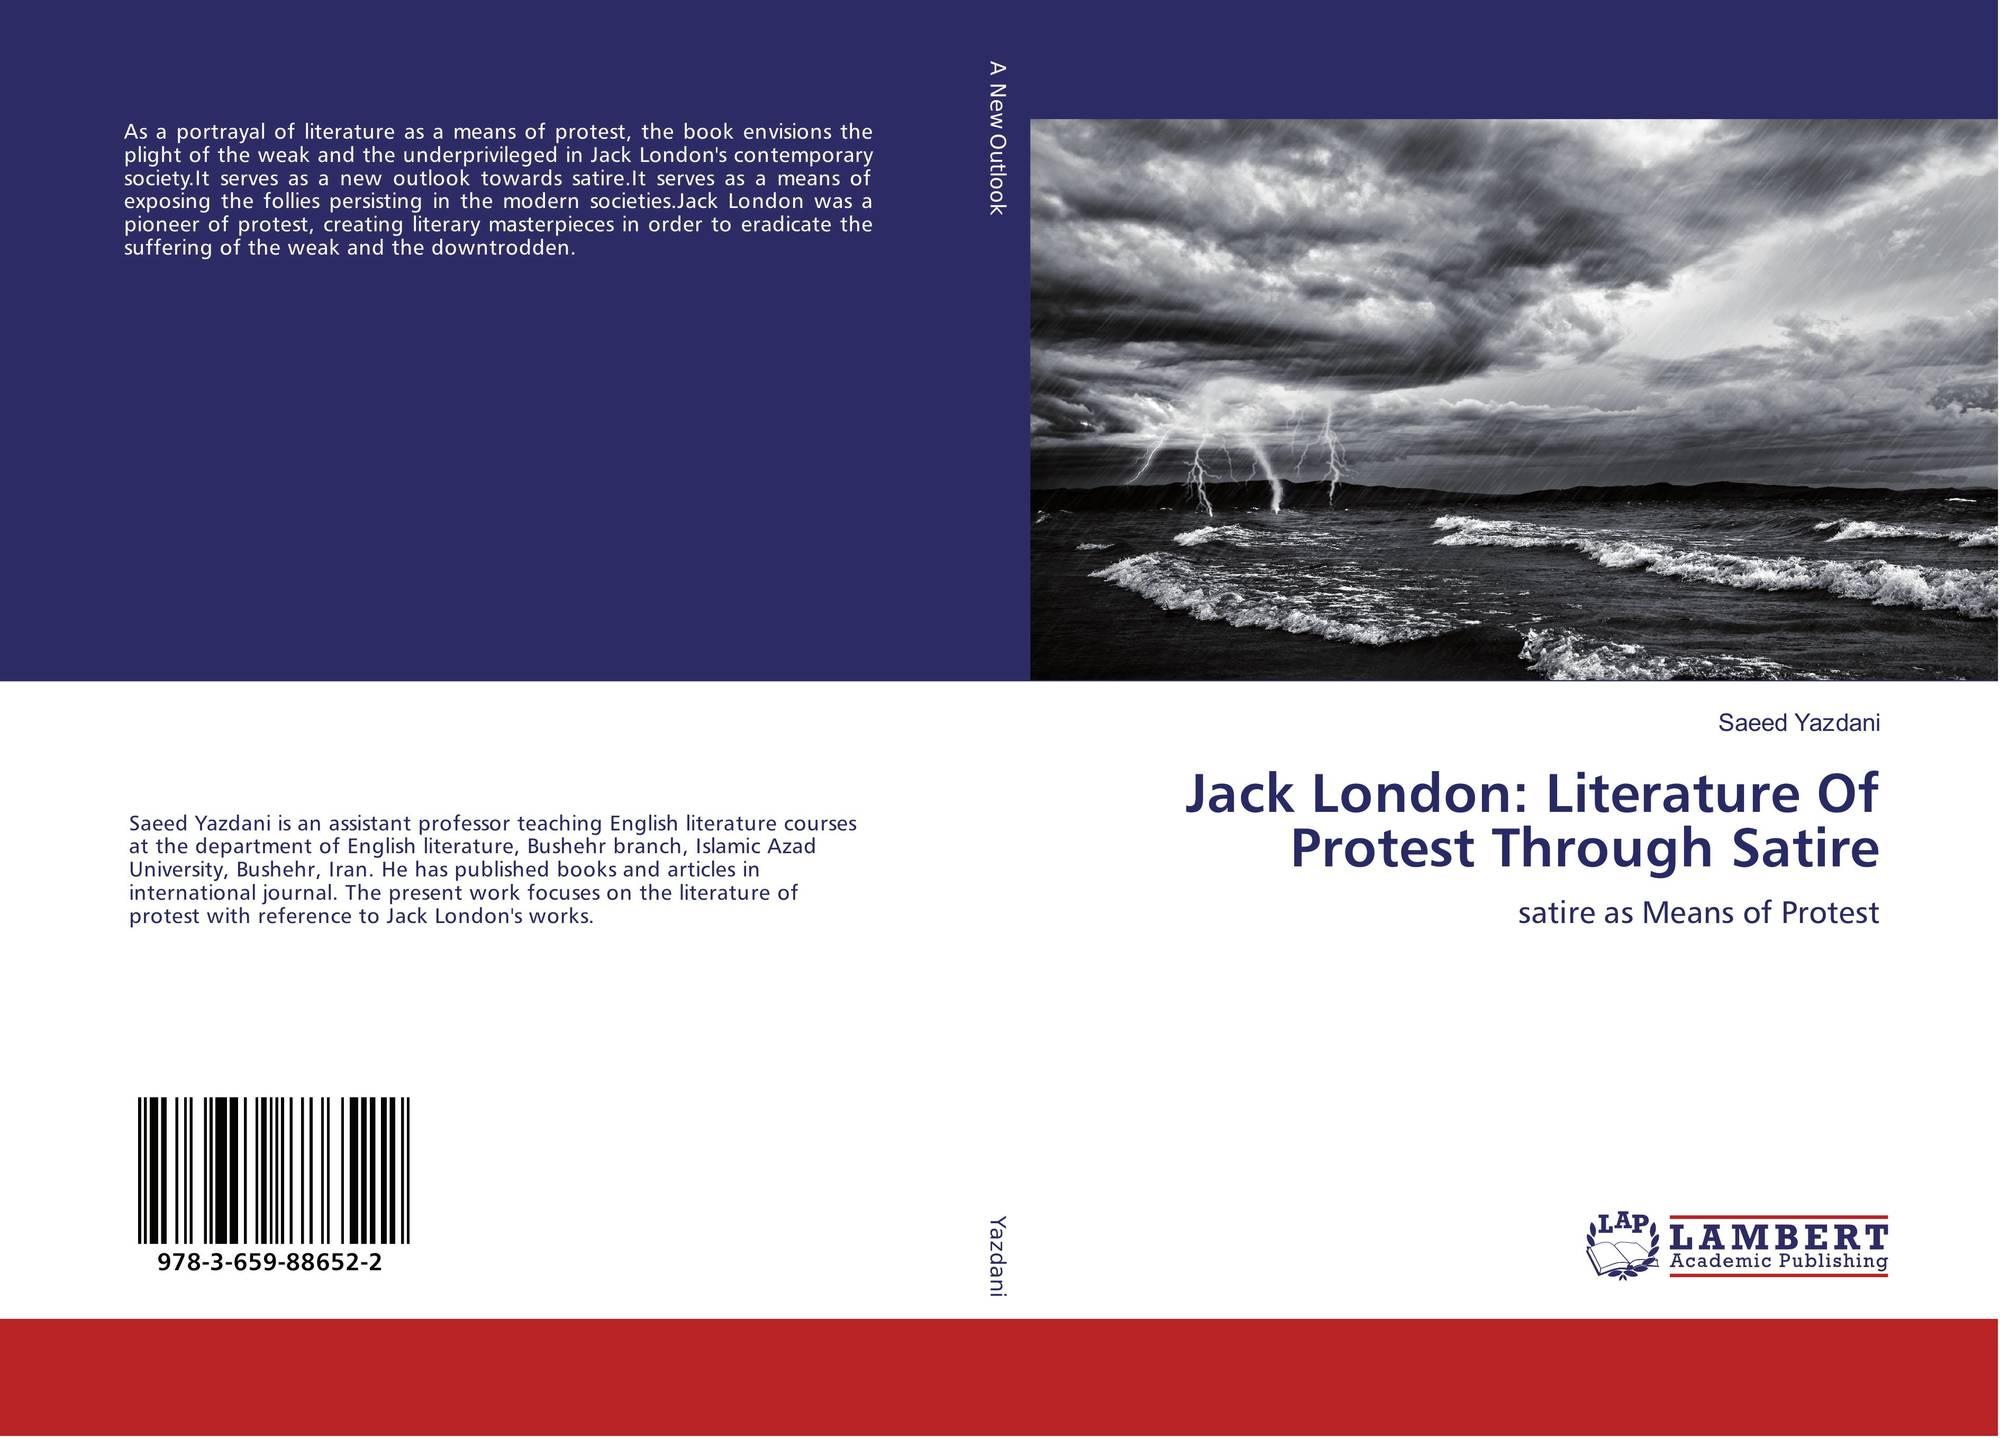 Jack London Literature Of Protest Through Satire 978 3 659 88652